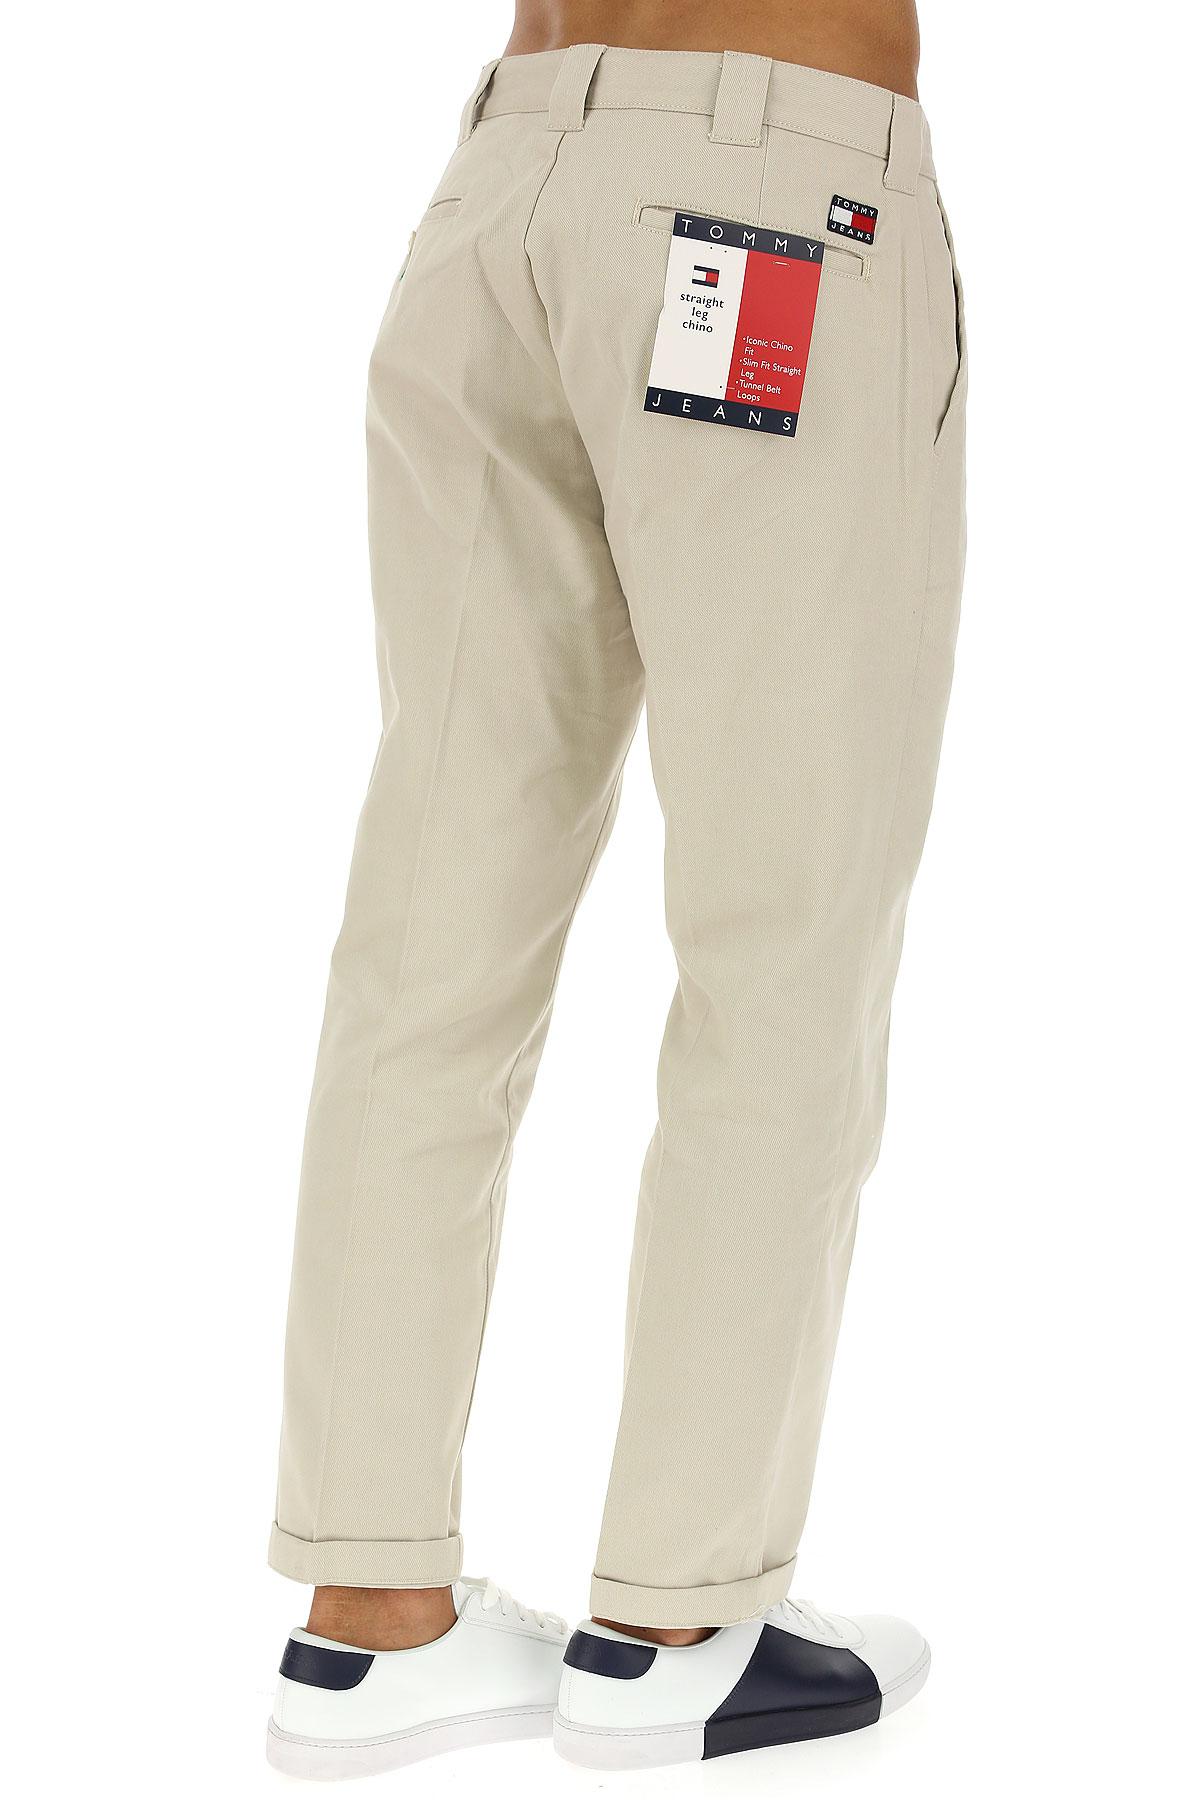 Mens Clothing Tommy Hilfiger Style Code Dm0dm04827 011